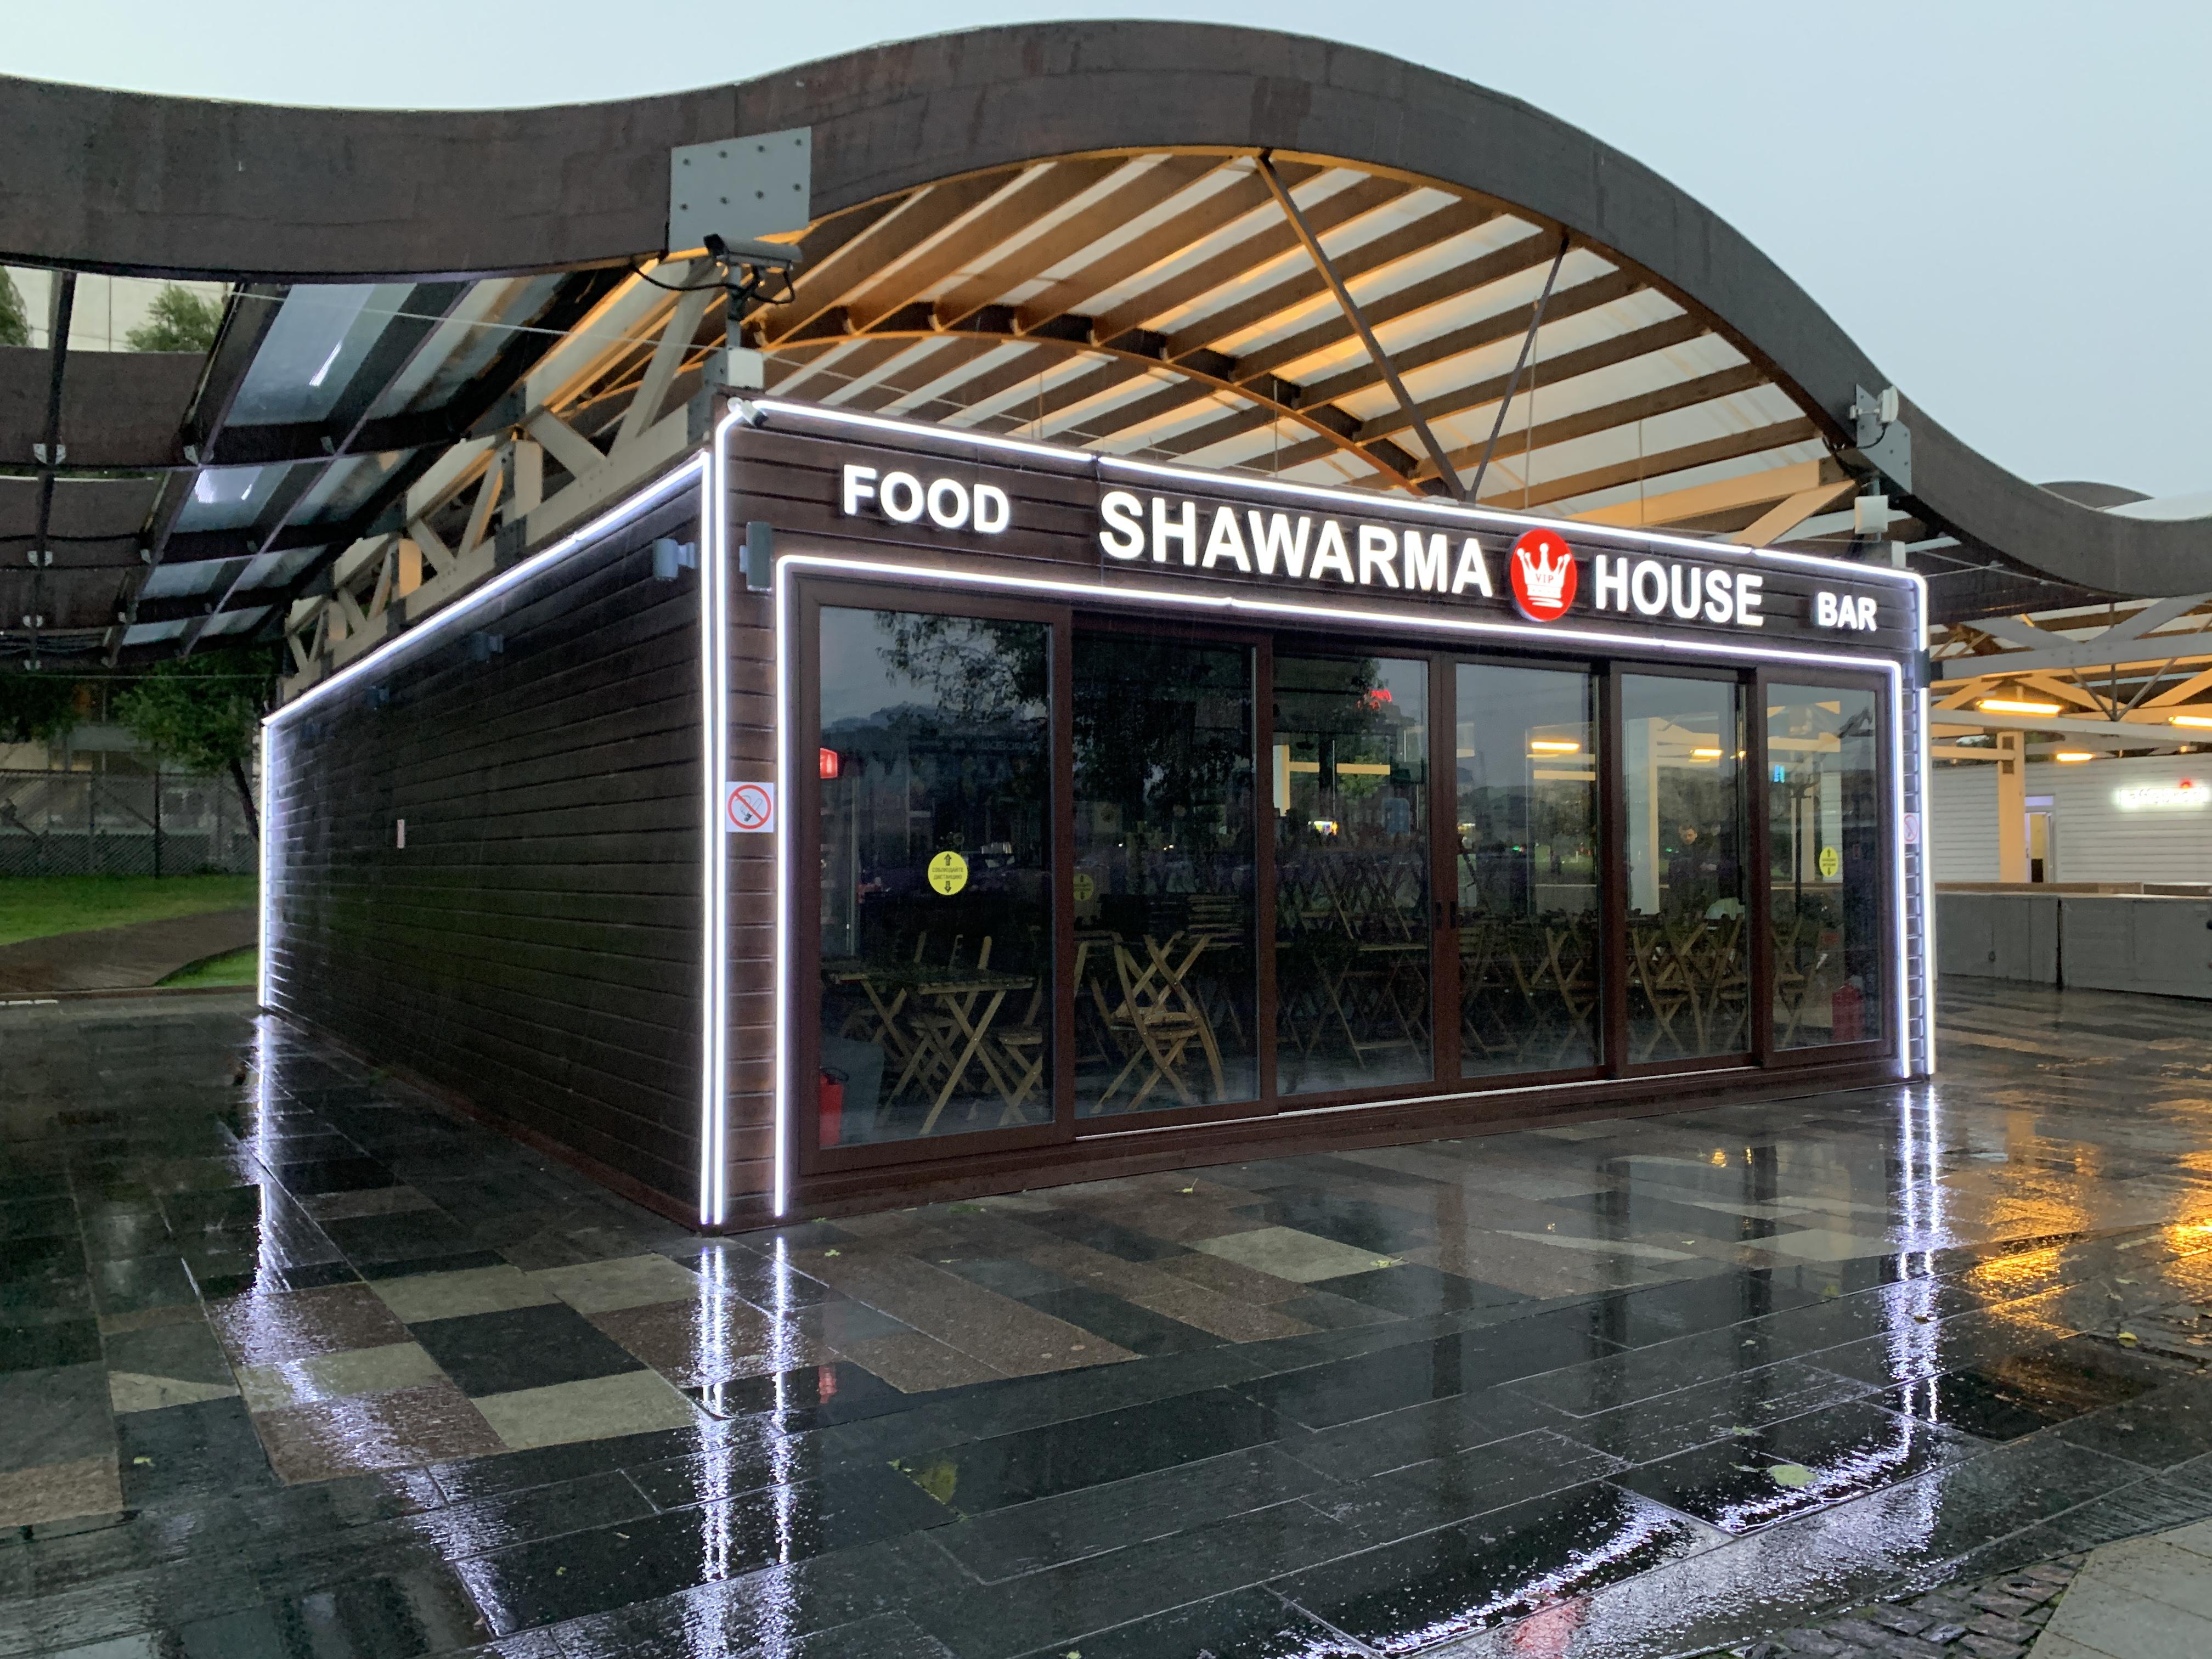 Город: Москва<br/>Заведение: Shawarma VIP House<br/>ставка: 200₽/ч руб/ч